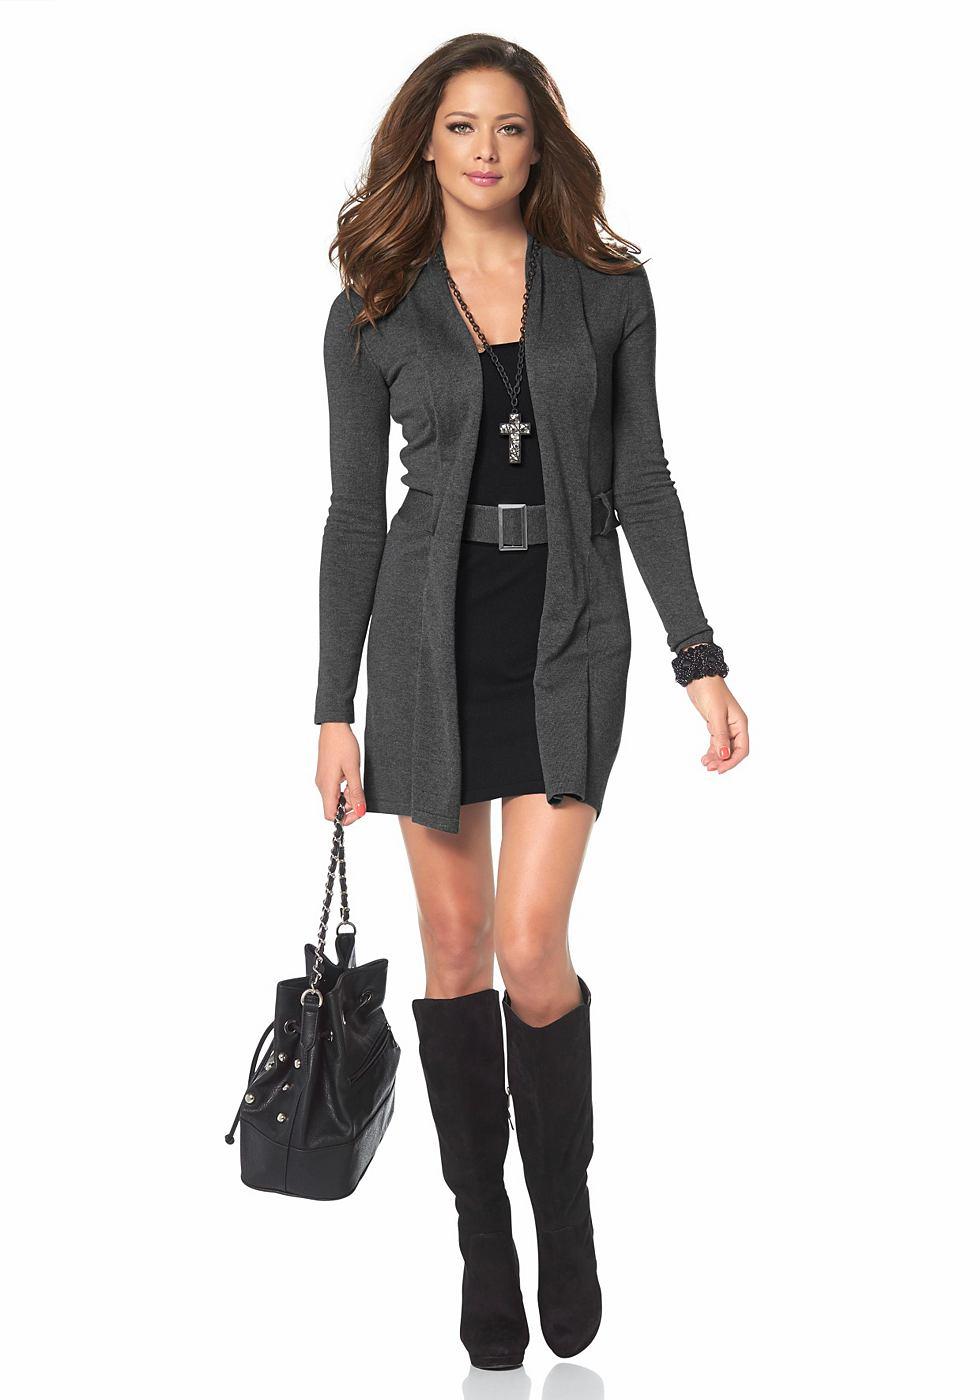 Melrose Tricot-jurk in 2-in-1-look grijs